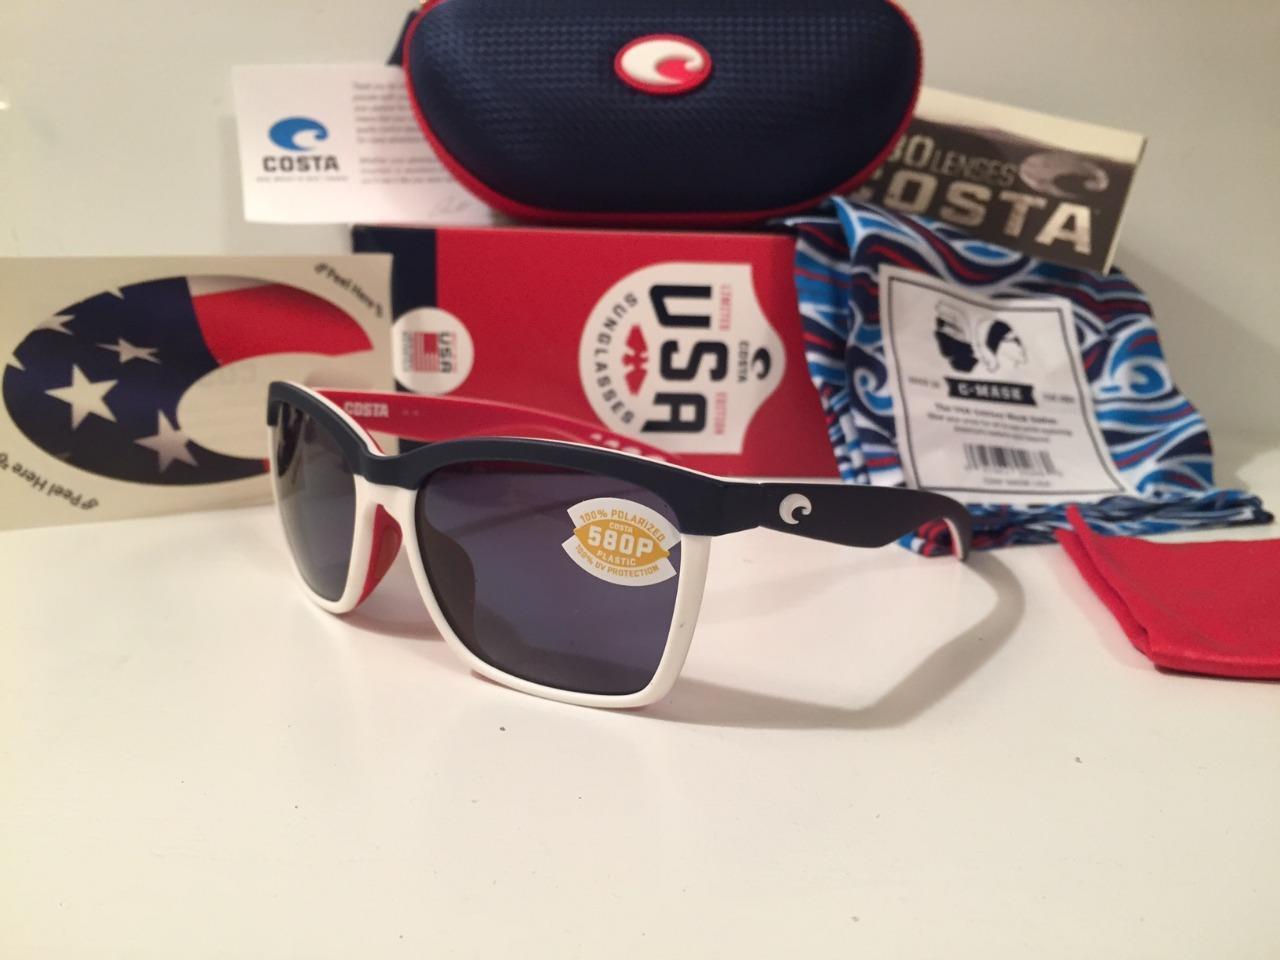 Costa Del Mar Anaa Men/'s Sunglasses USA Blue//Gray 580P Polarized ANA112 NEW